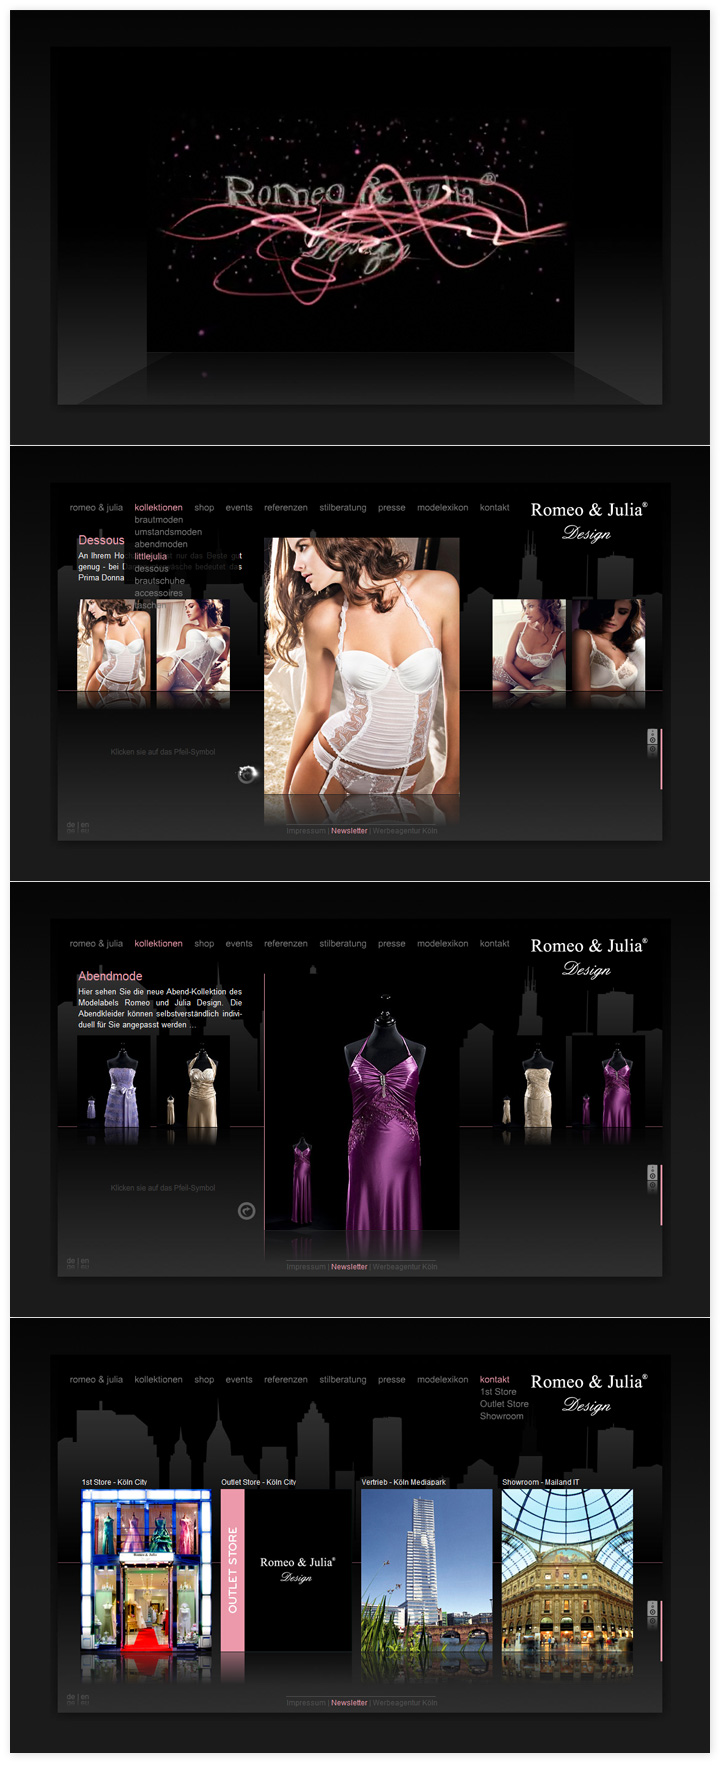 romeo-julia-design-04